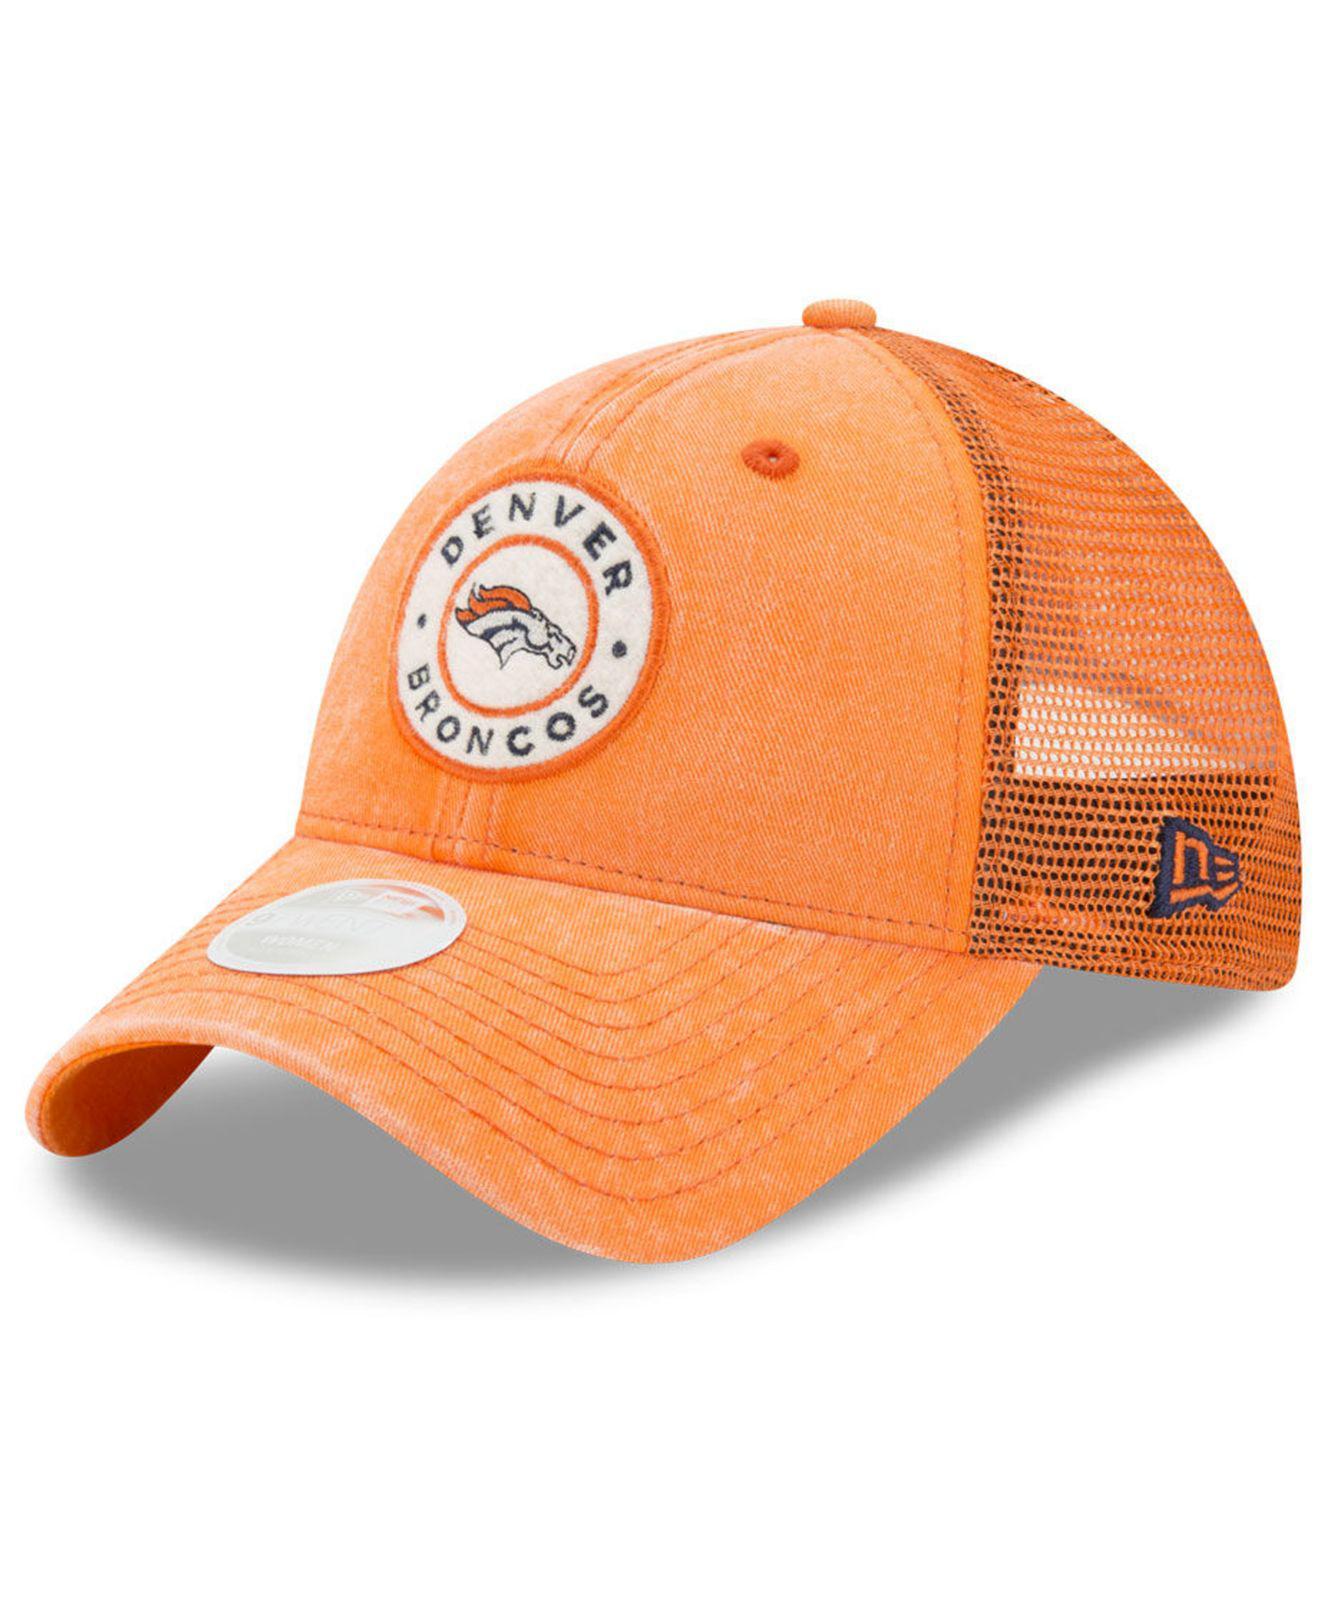 online store 83dfe dcae8 ... 9twenty Snapback Cap - Lyst. View fullscreen